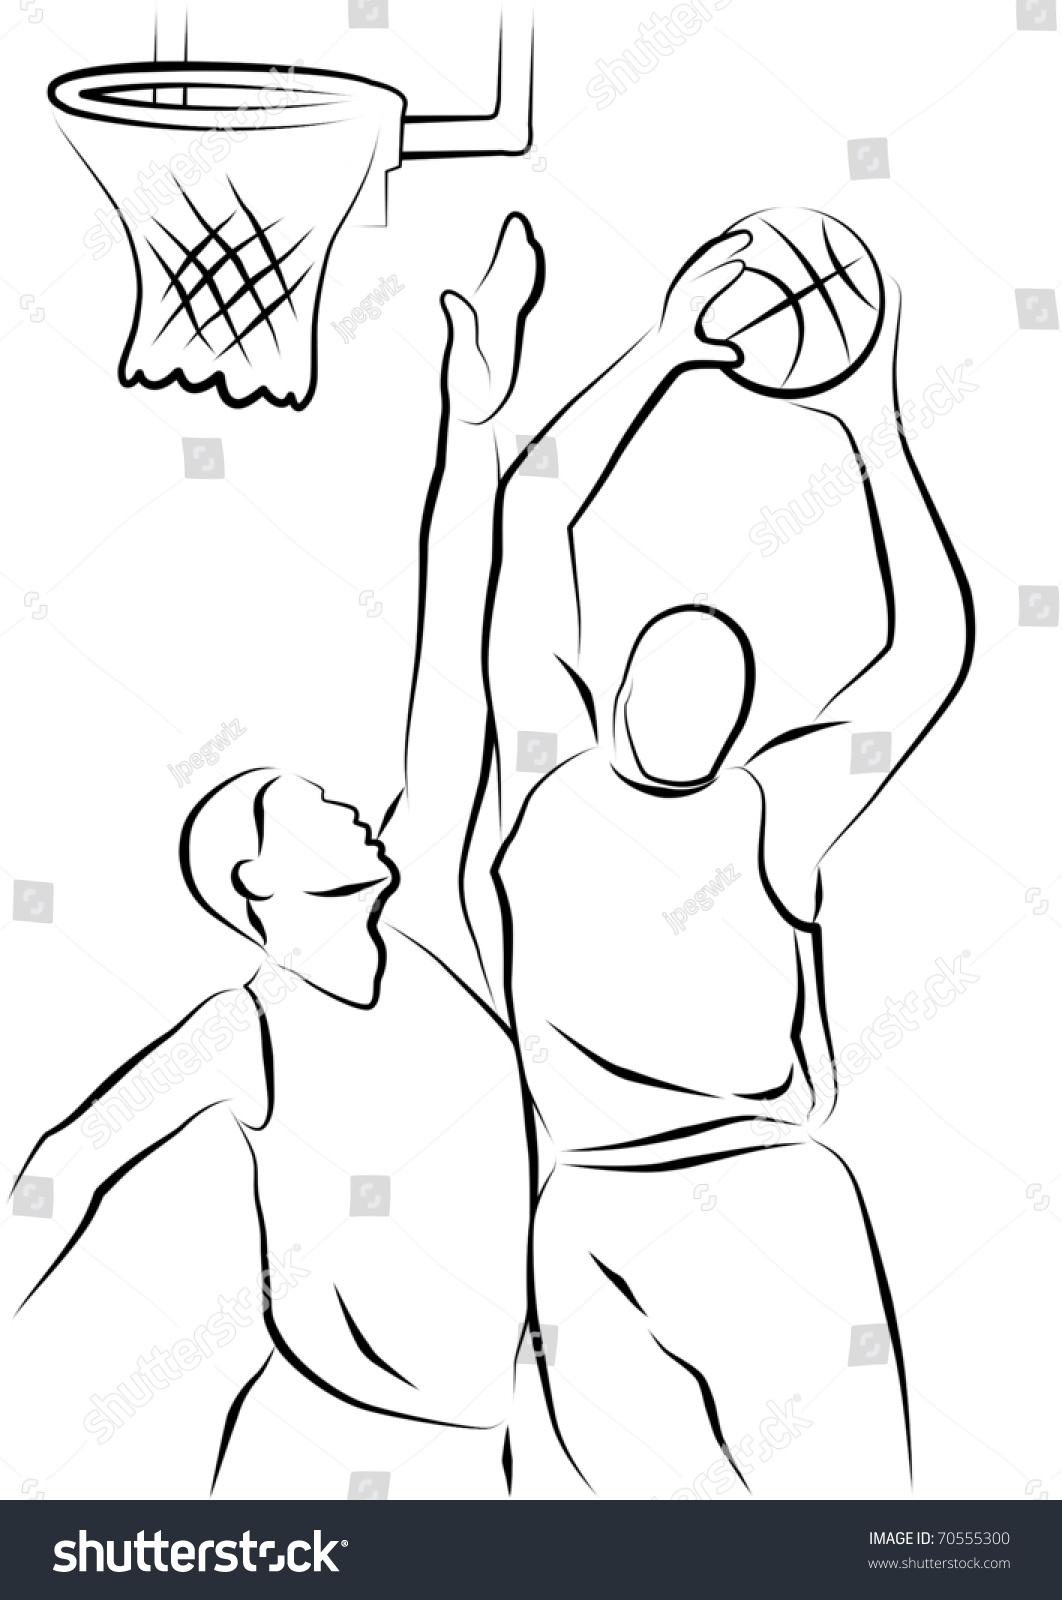 Line Drawing Basketball : Line drawing two basketball players stock illustration